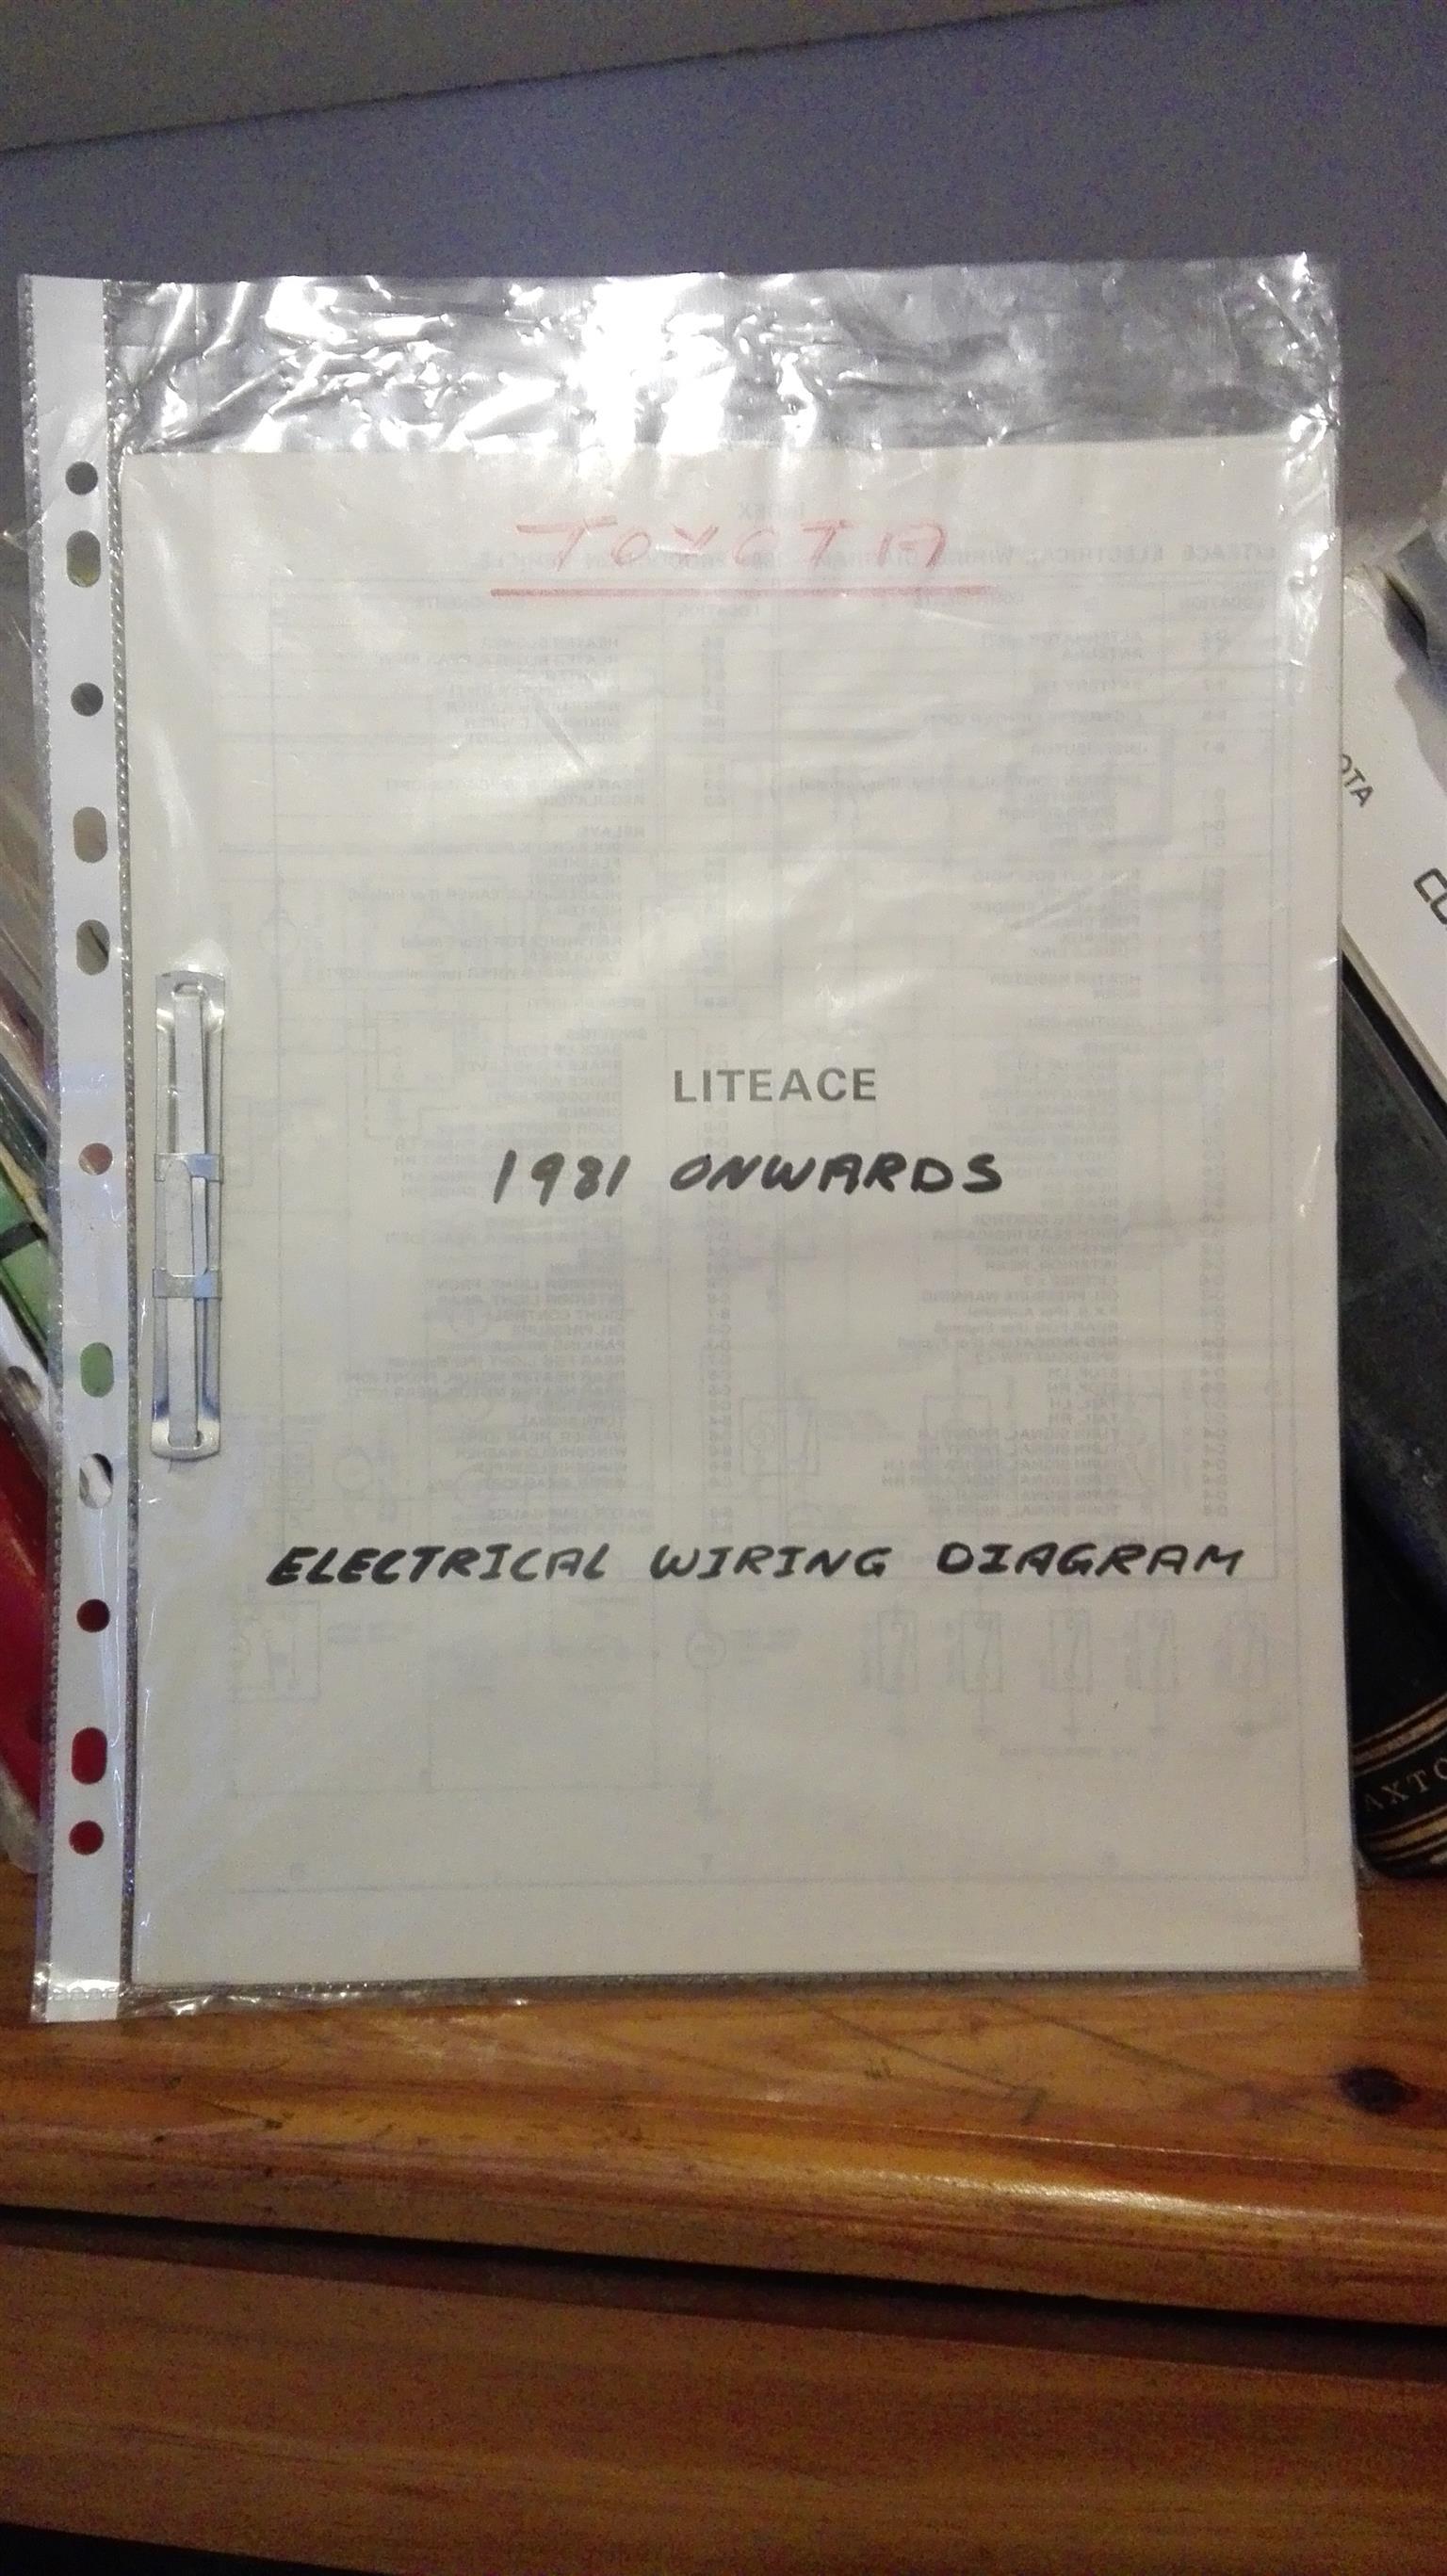 lite ace 1981 82 electrical wiring diagram junk mail. Black Bedroom Furniture Sets. Home Design Ideas